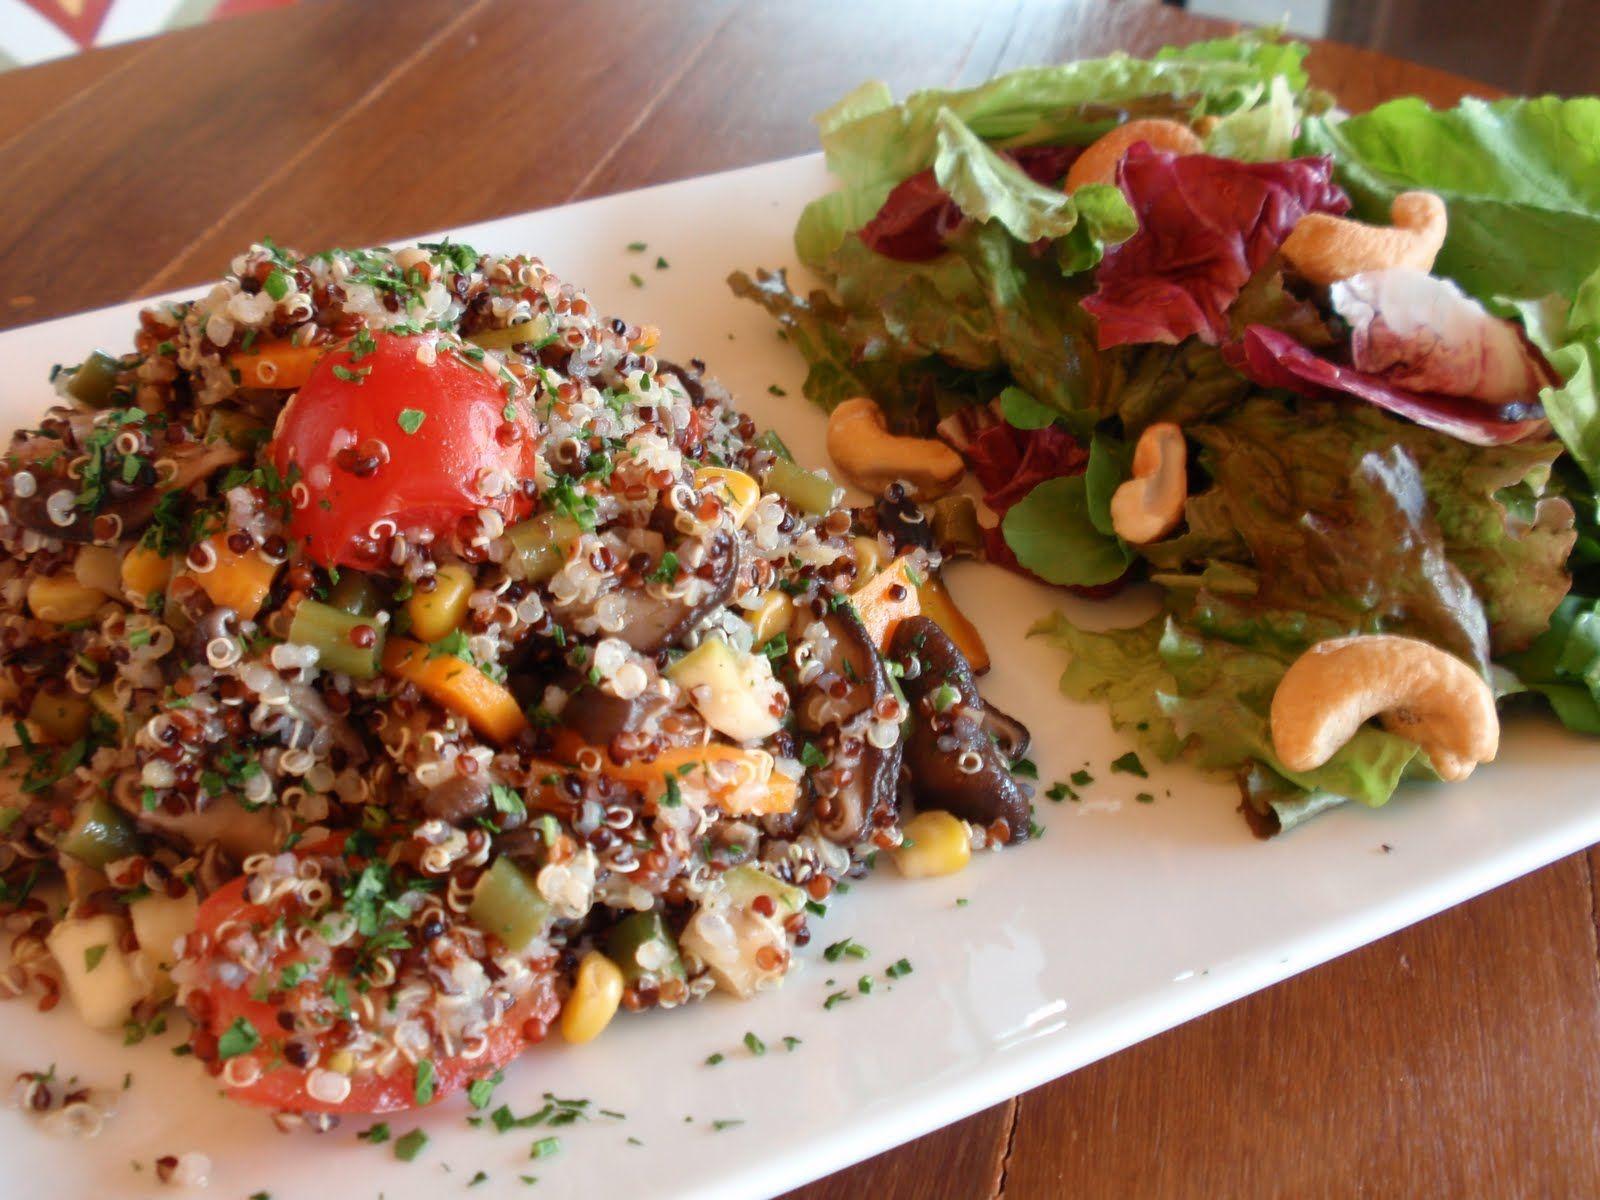 alimentos organicos - Pesquisa Google